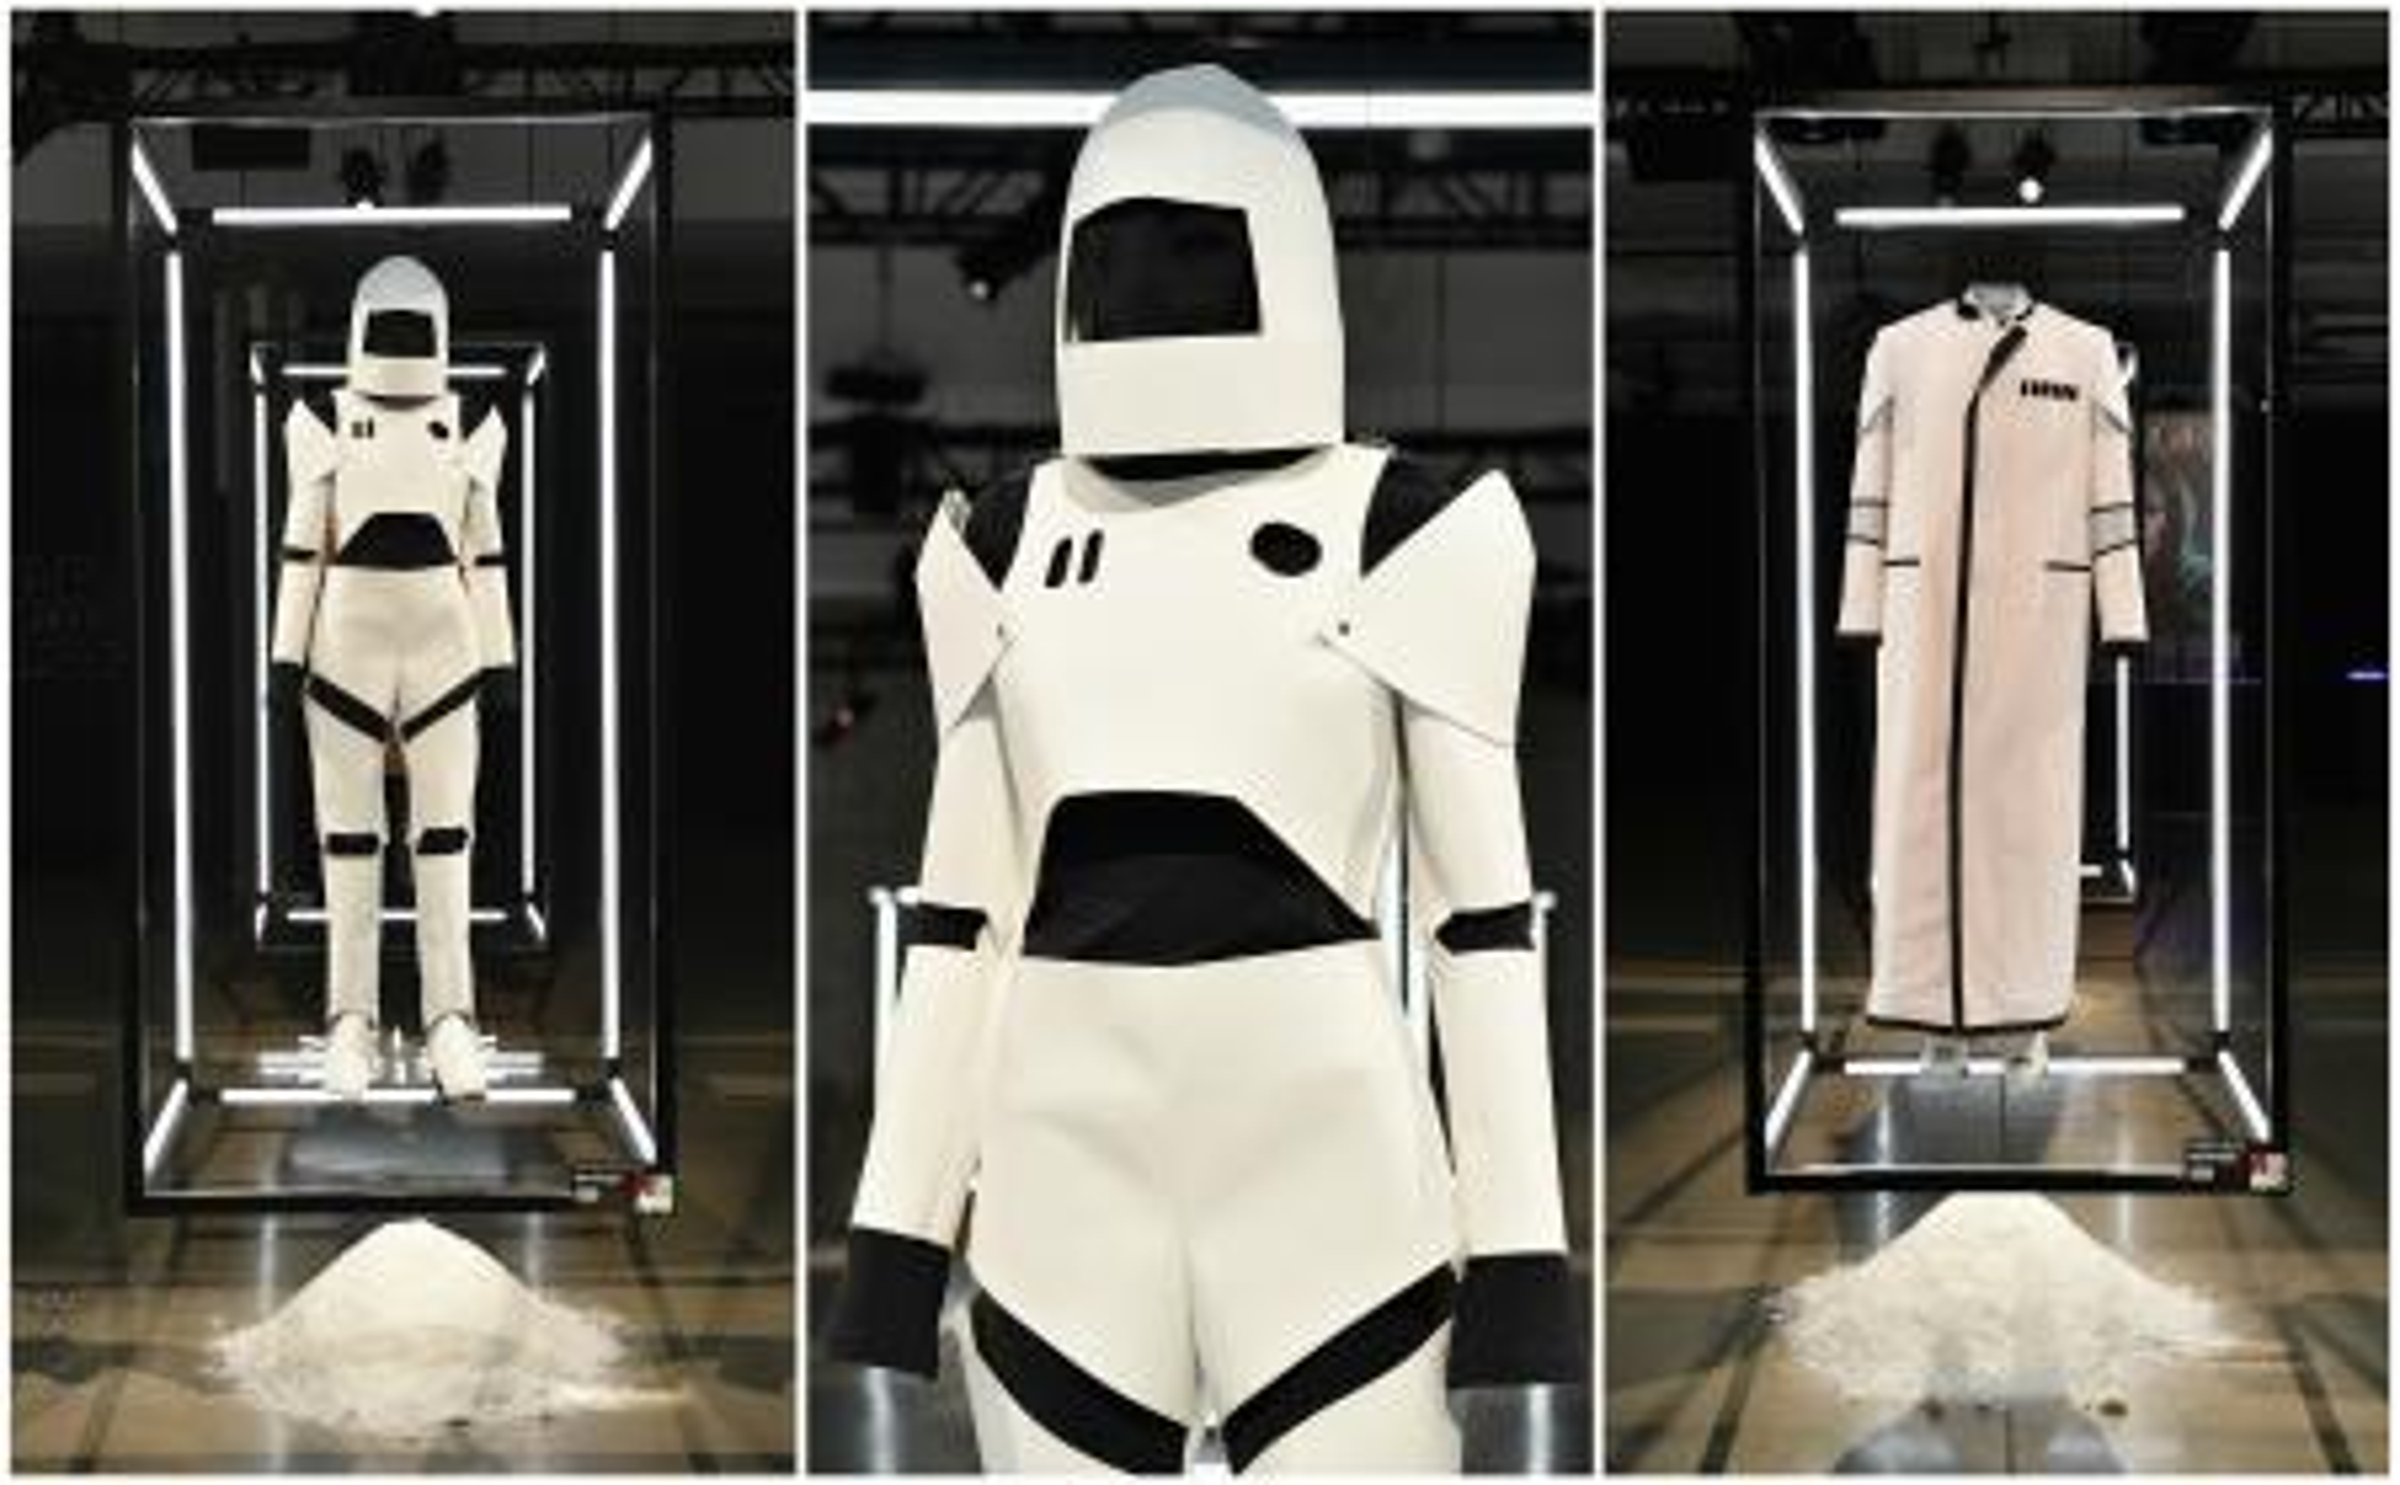 Stormtrooper looks